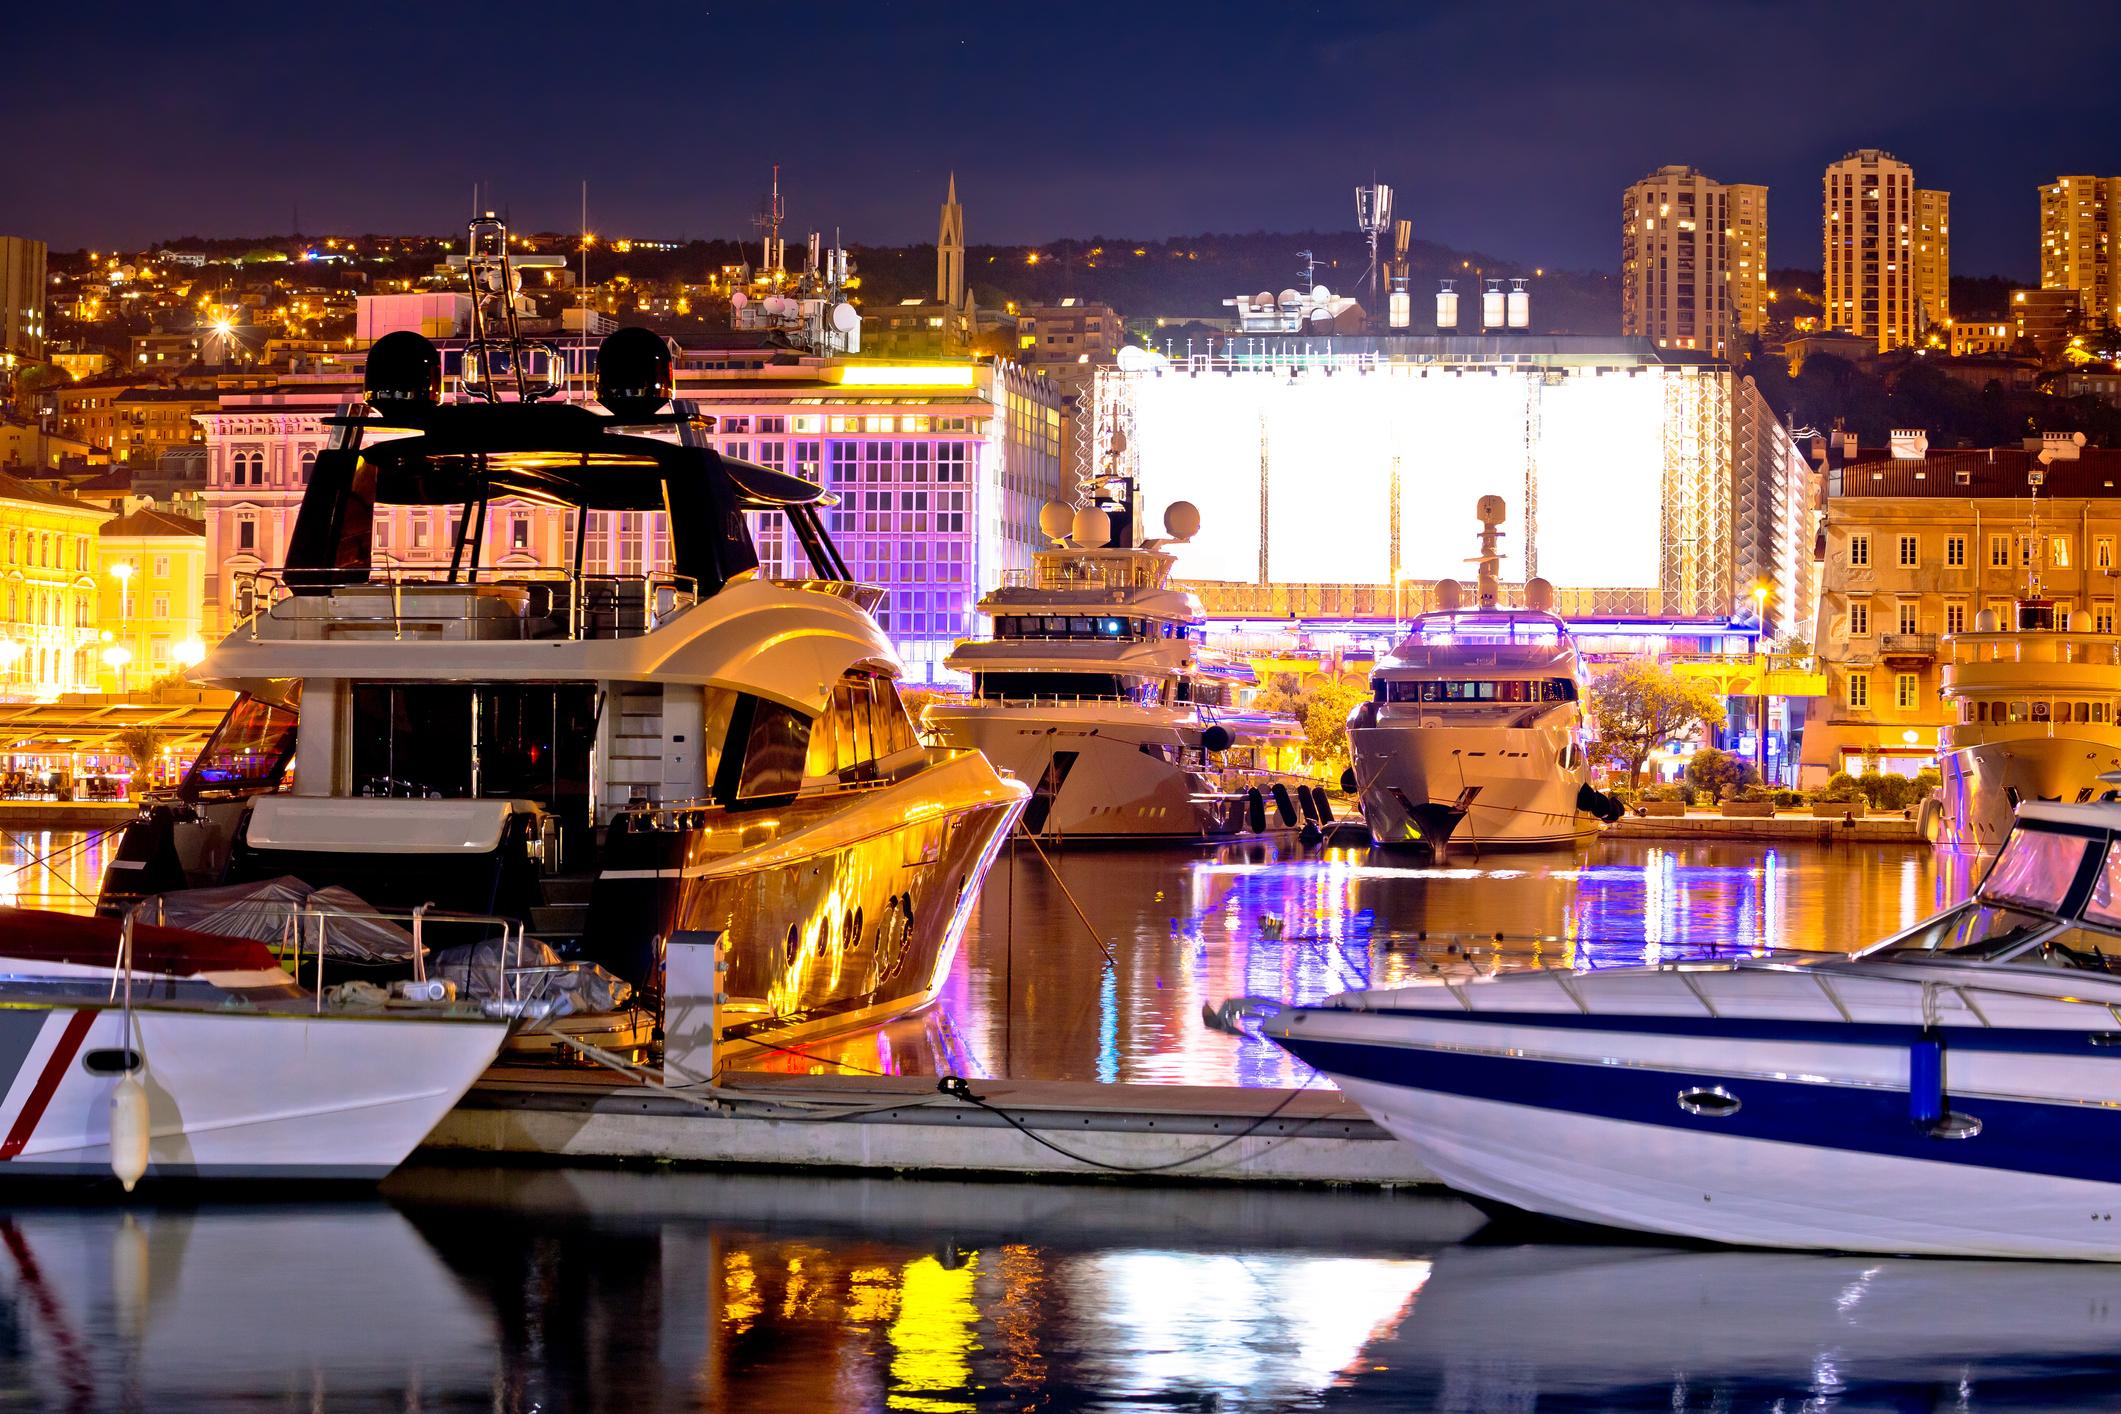 City of Rijeka yachting waterfront evening view, Kvarner bay, Croatia